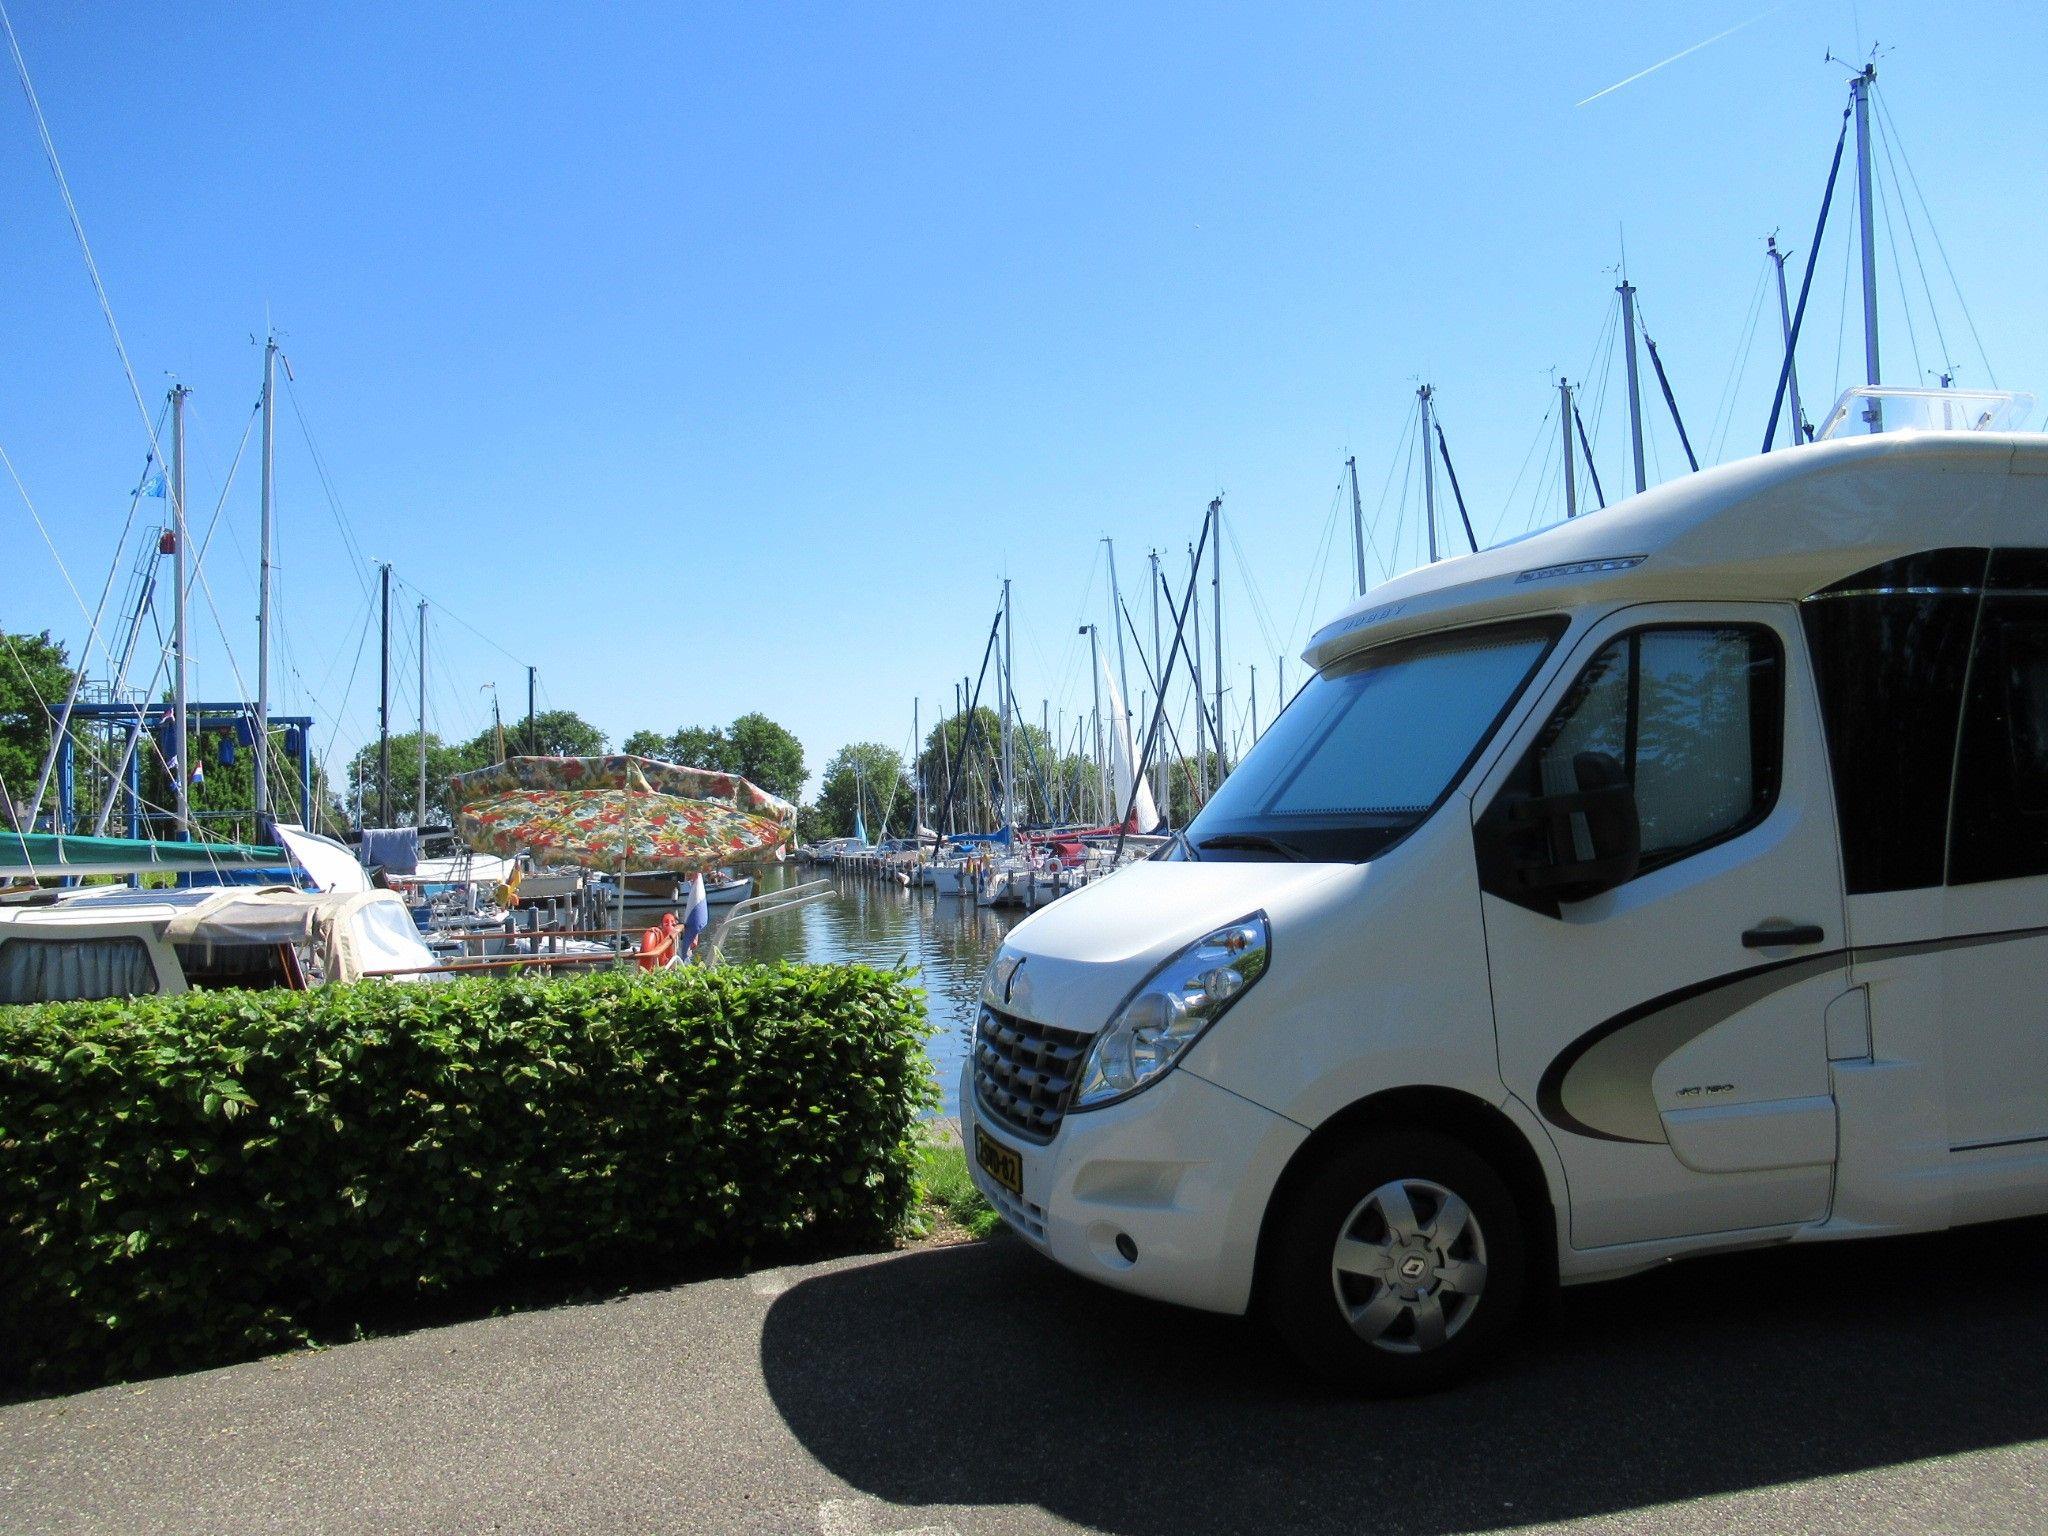 Camperplaatsen Jachthaven En Camping Lutsmond Balk Camping Wassersport